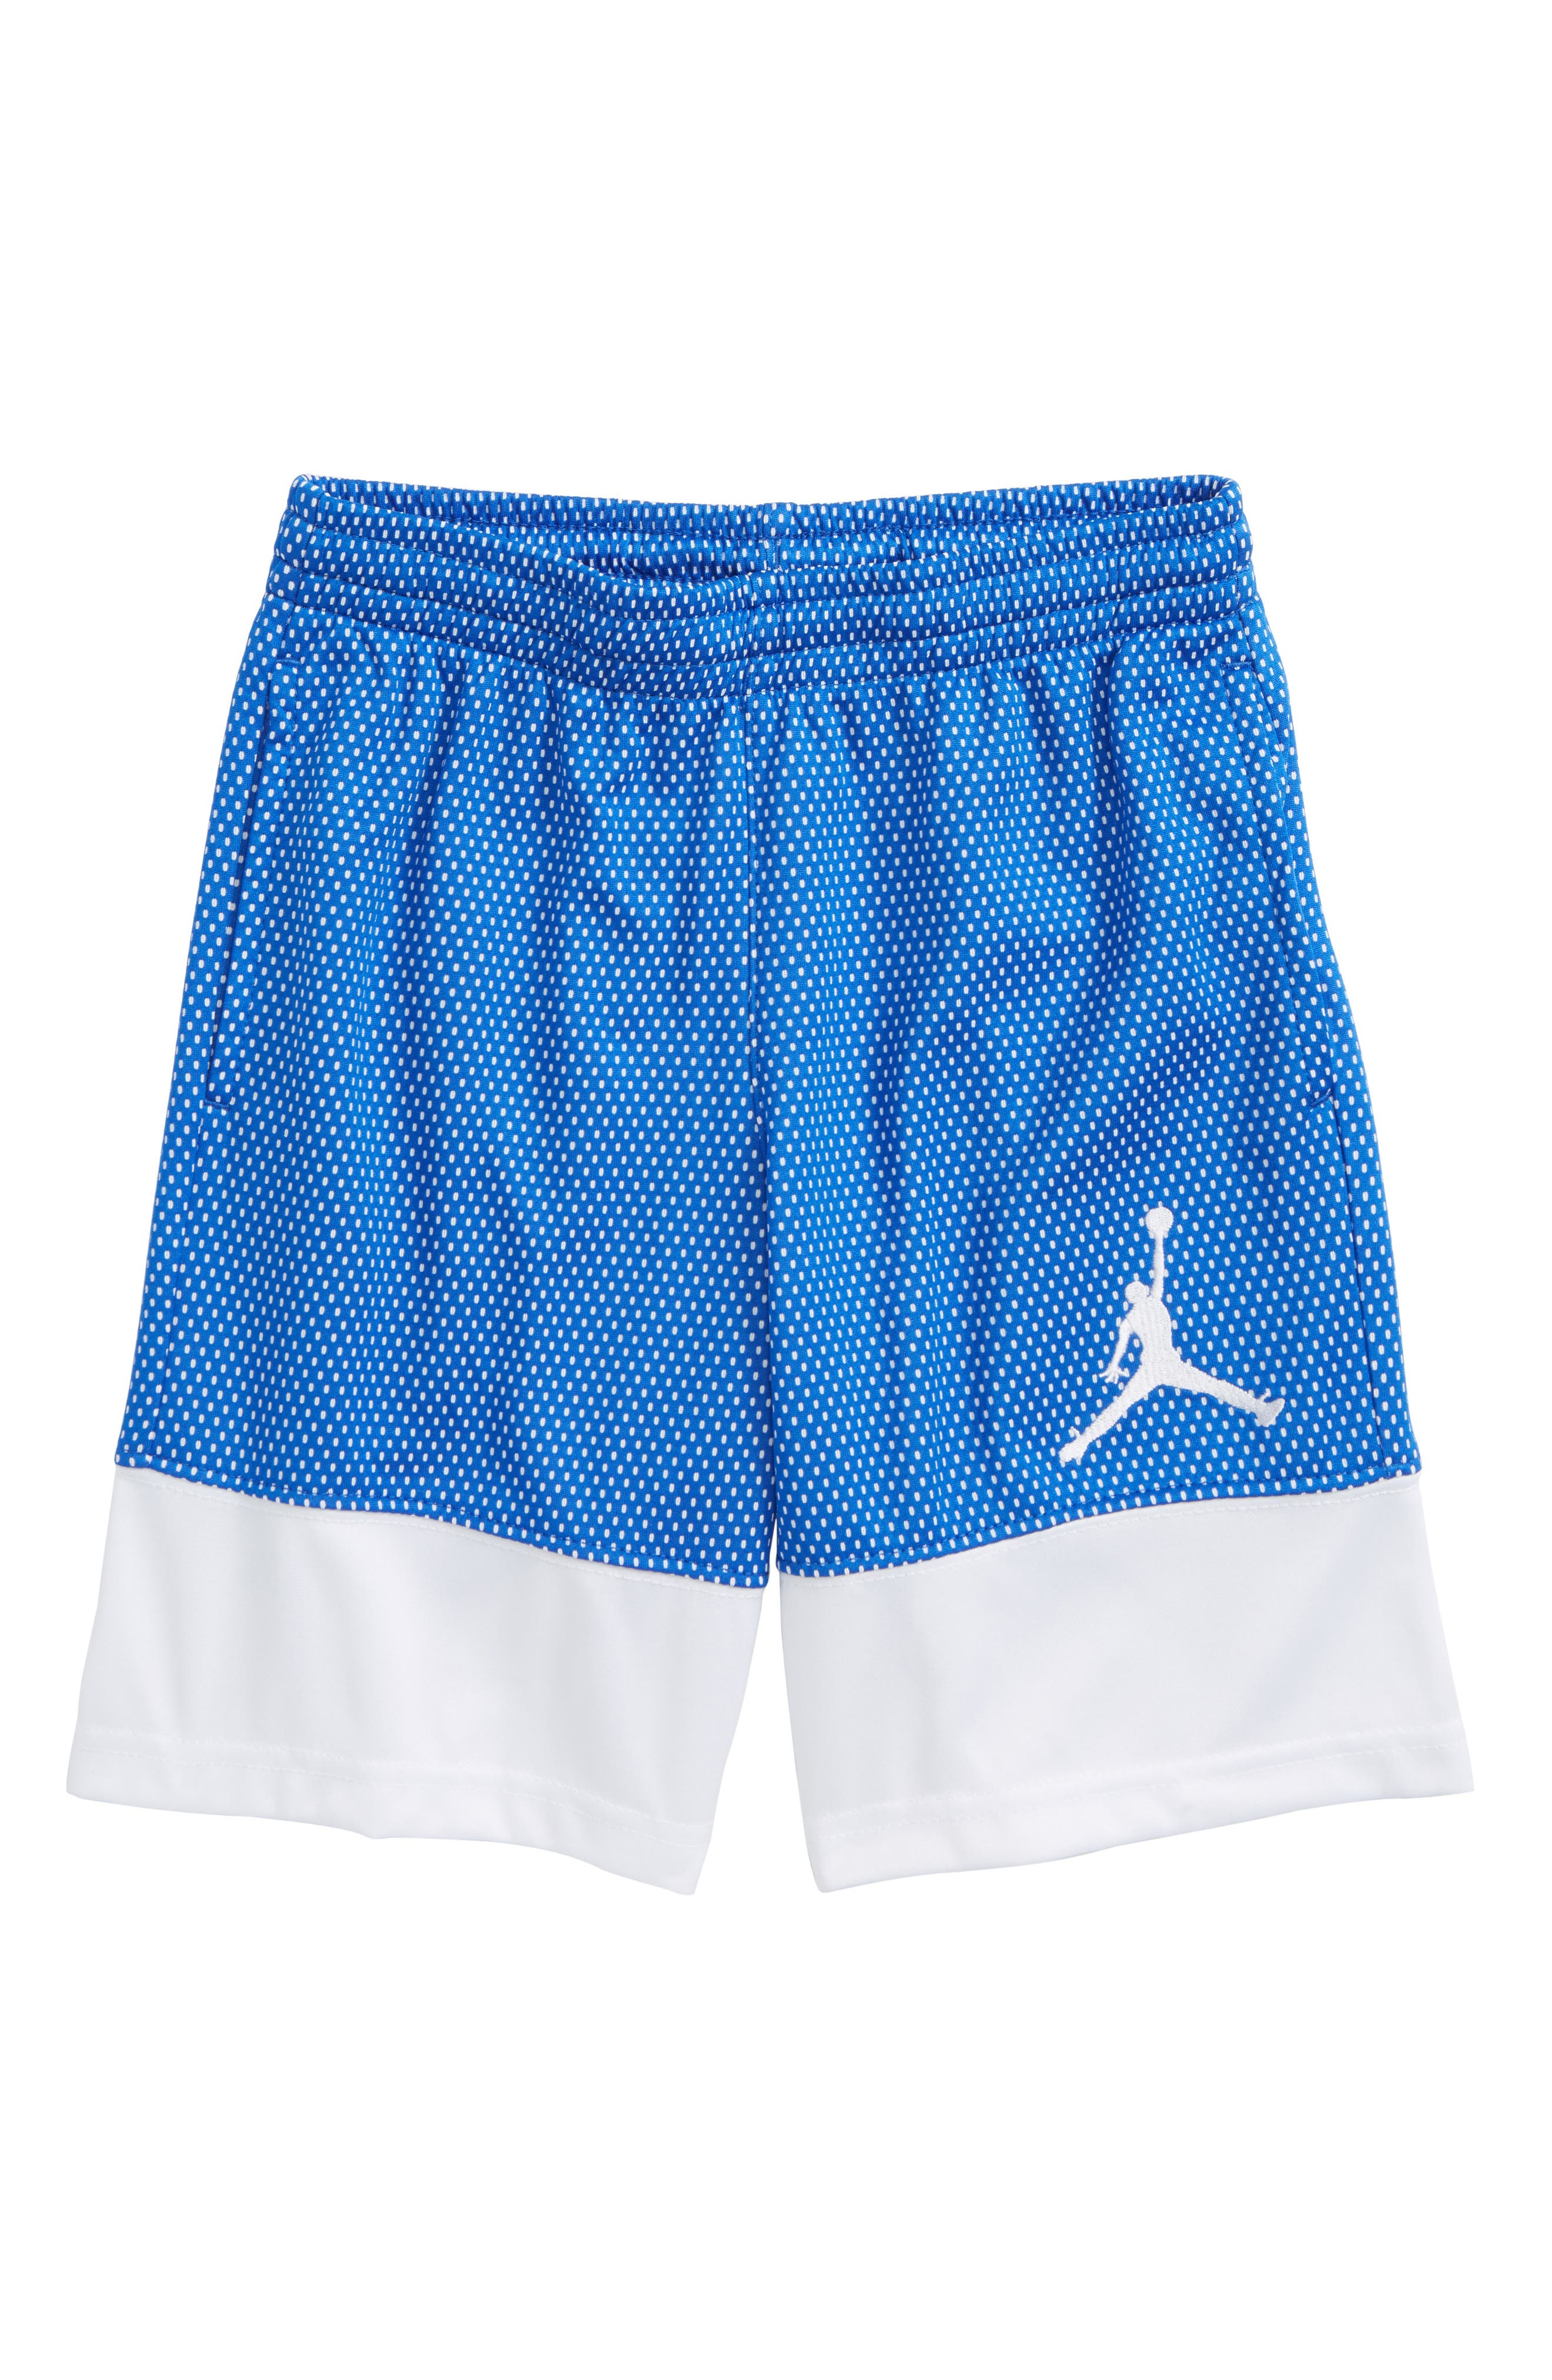 Jordan '90s Mesh Shorts (Toddler Boys & Little Boys)